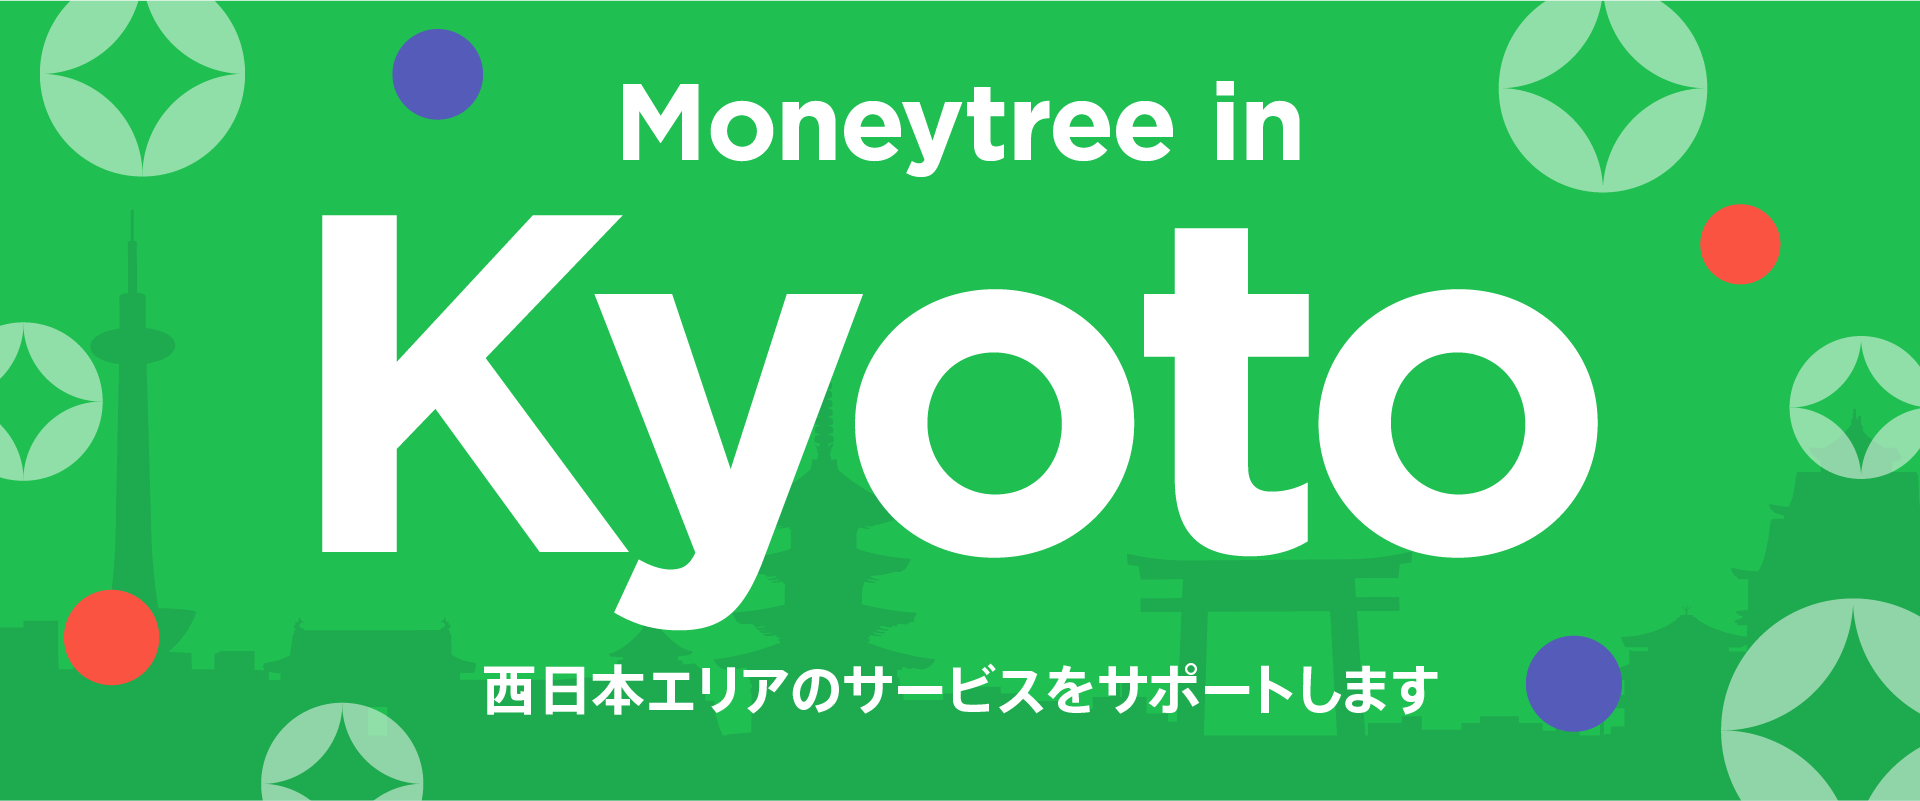 PressRelease KyotoOfficeLaunch top Final